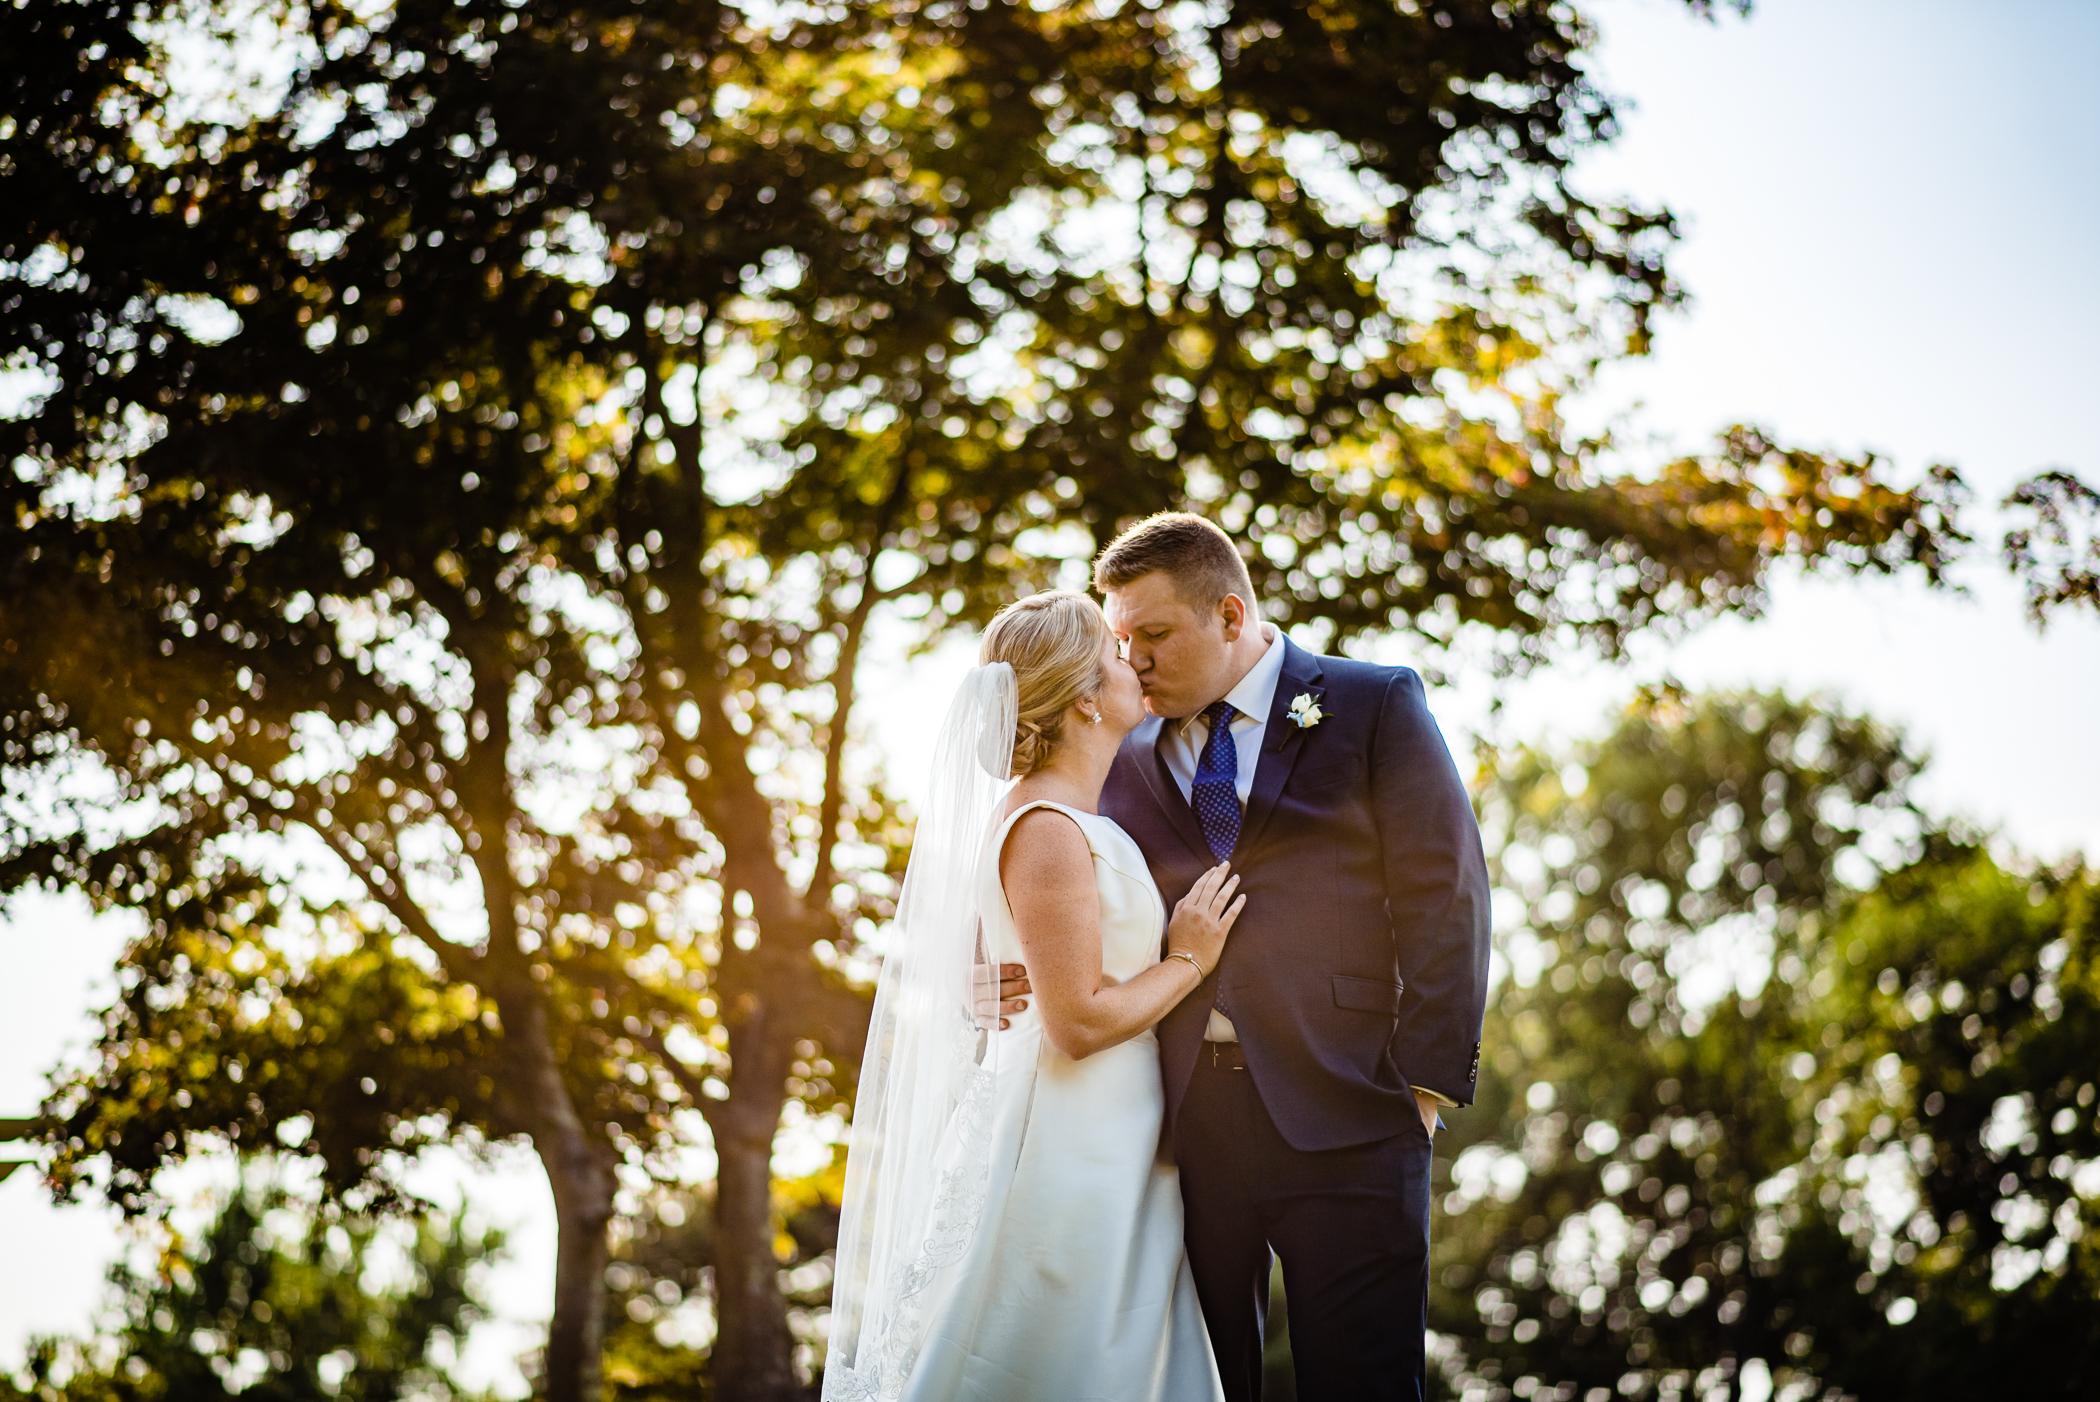 inn-at-mystic-wedding-photos-chris-nachtwey-2019-1.jpg